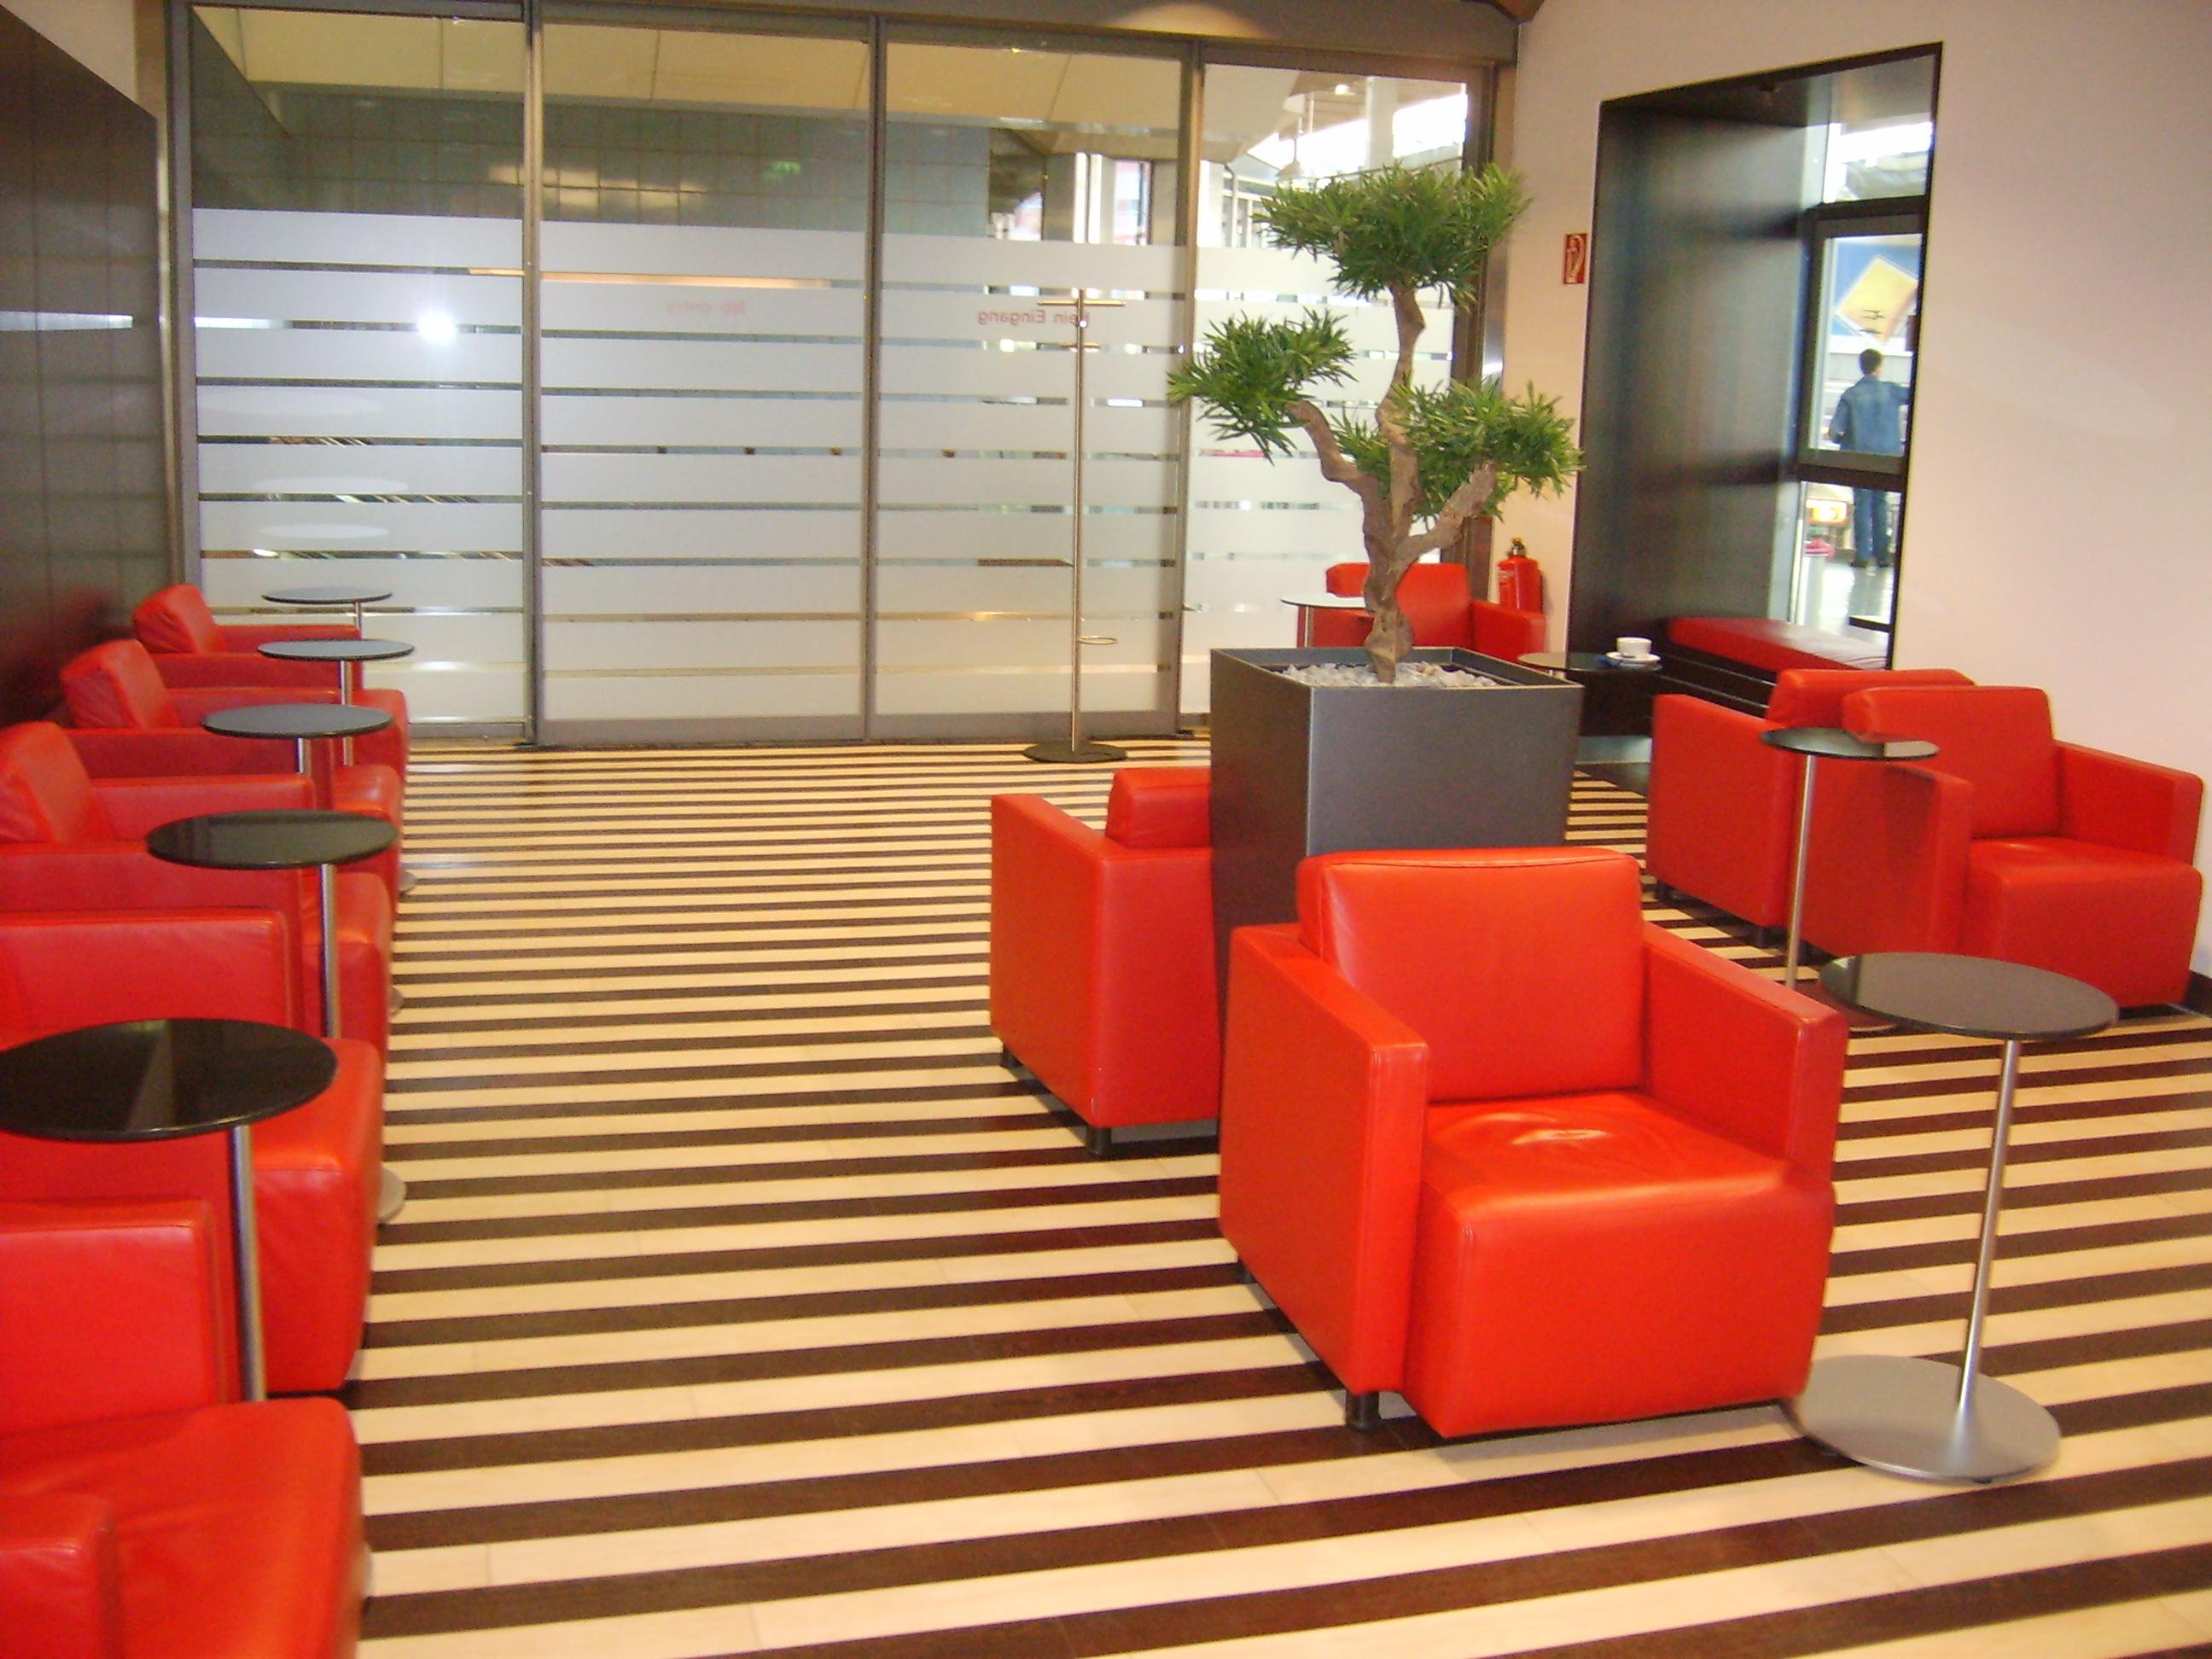 Datei:DB Lounge - 1. Klasse-Bereich München Hbf 3.JPG – Wikipedia